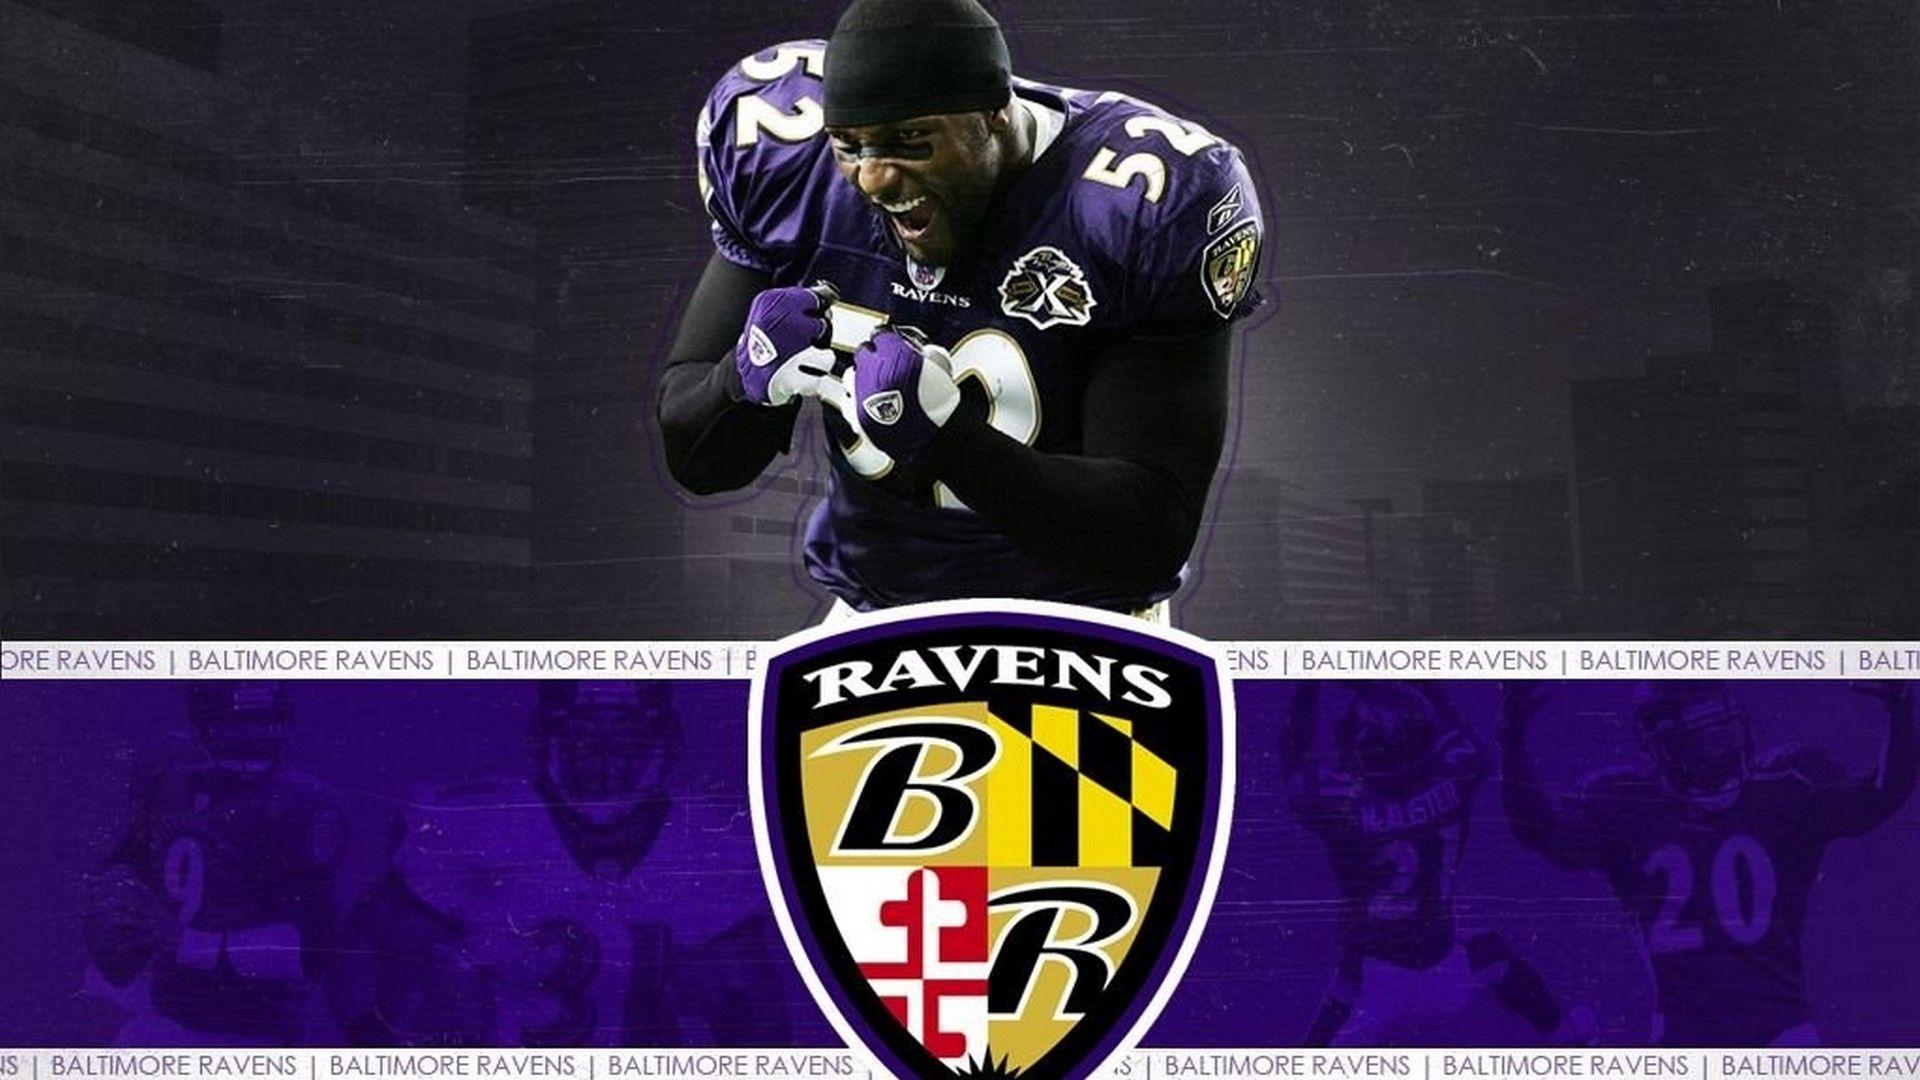 Ravens Desktop Wallpapers 2020 Nfl Football Wallpapers In 2020 Nfl Football Wallpaper Football Wallpaper Baltimore Ravens